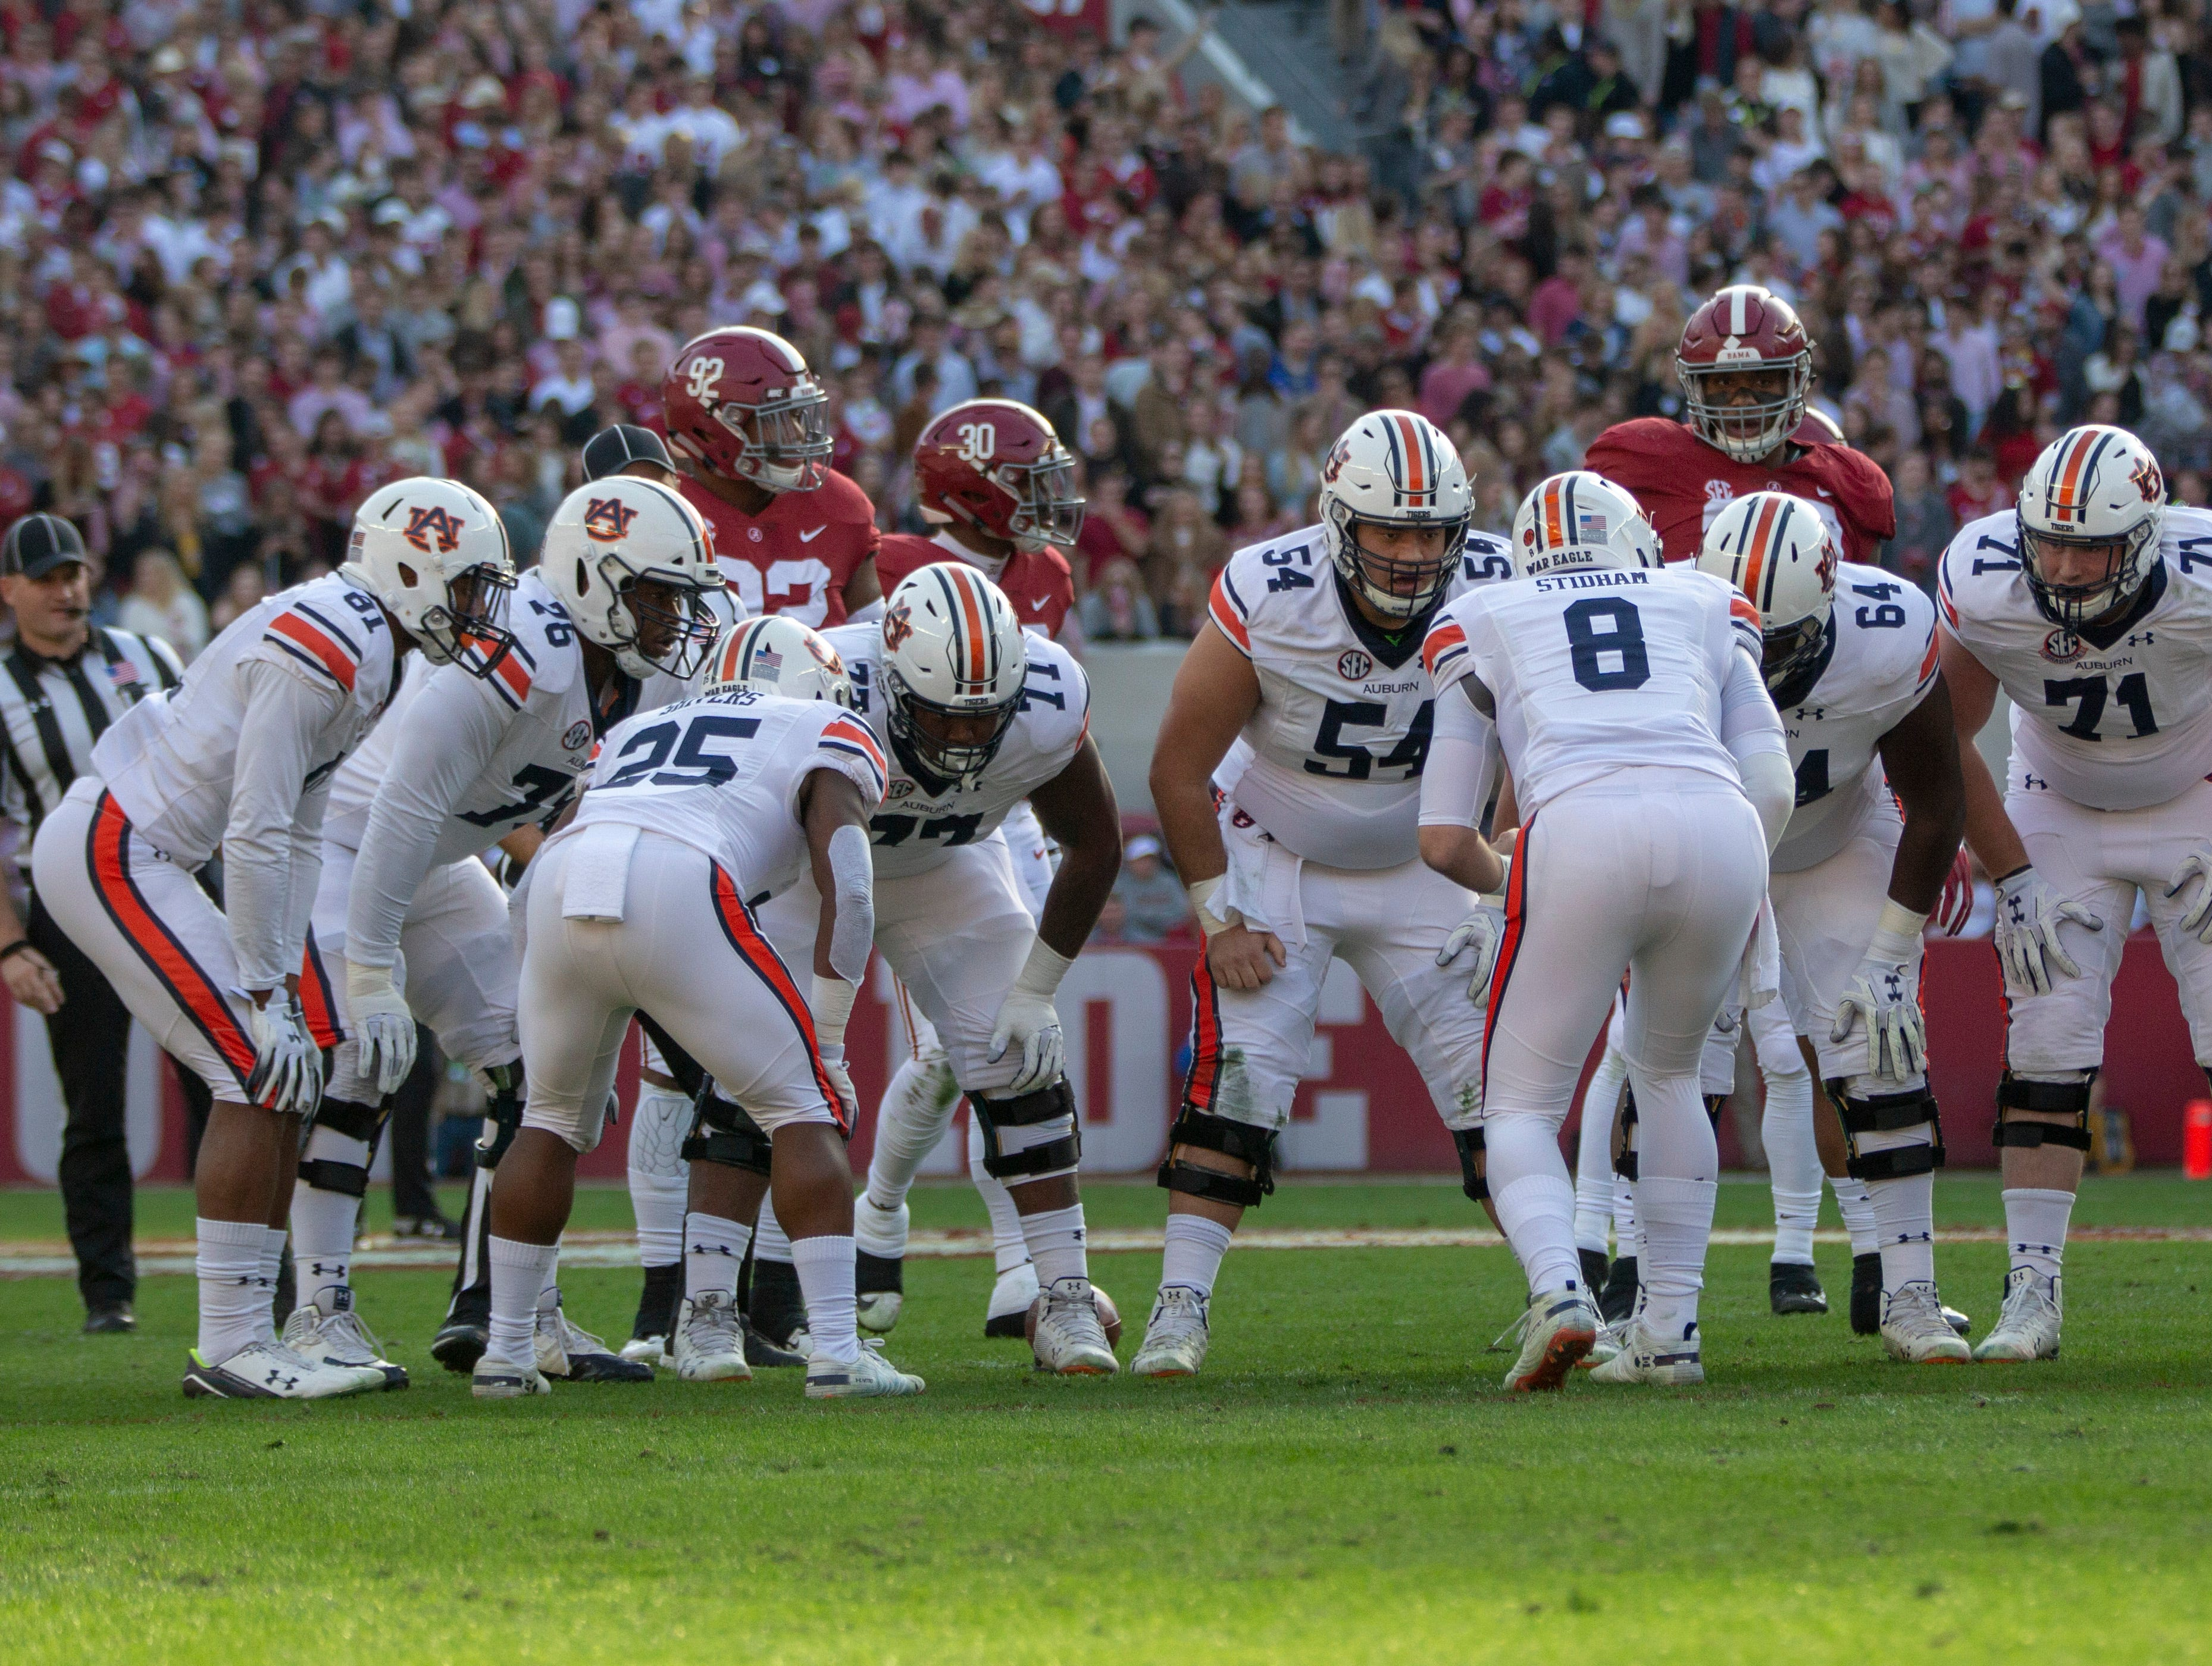 Auburn's team huddles around Jarrett Stidham before a play.